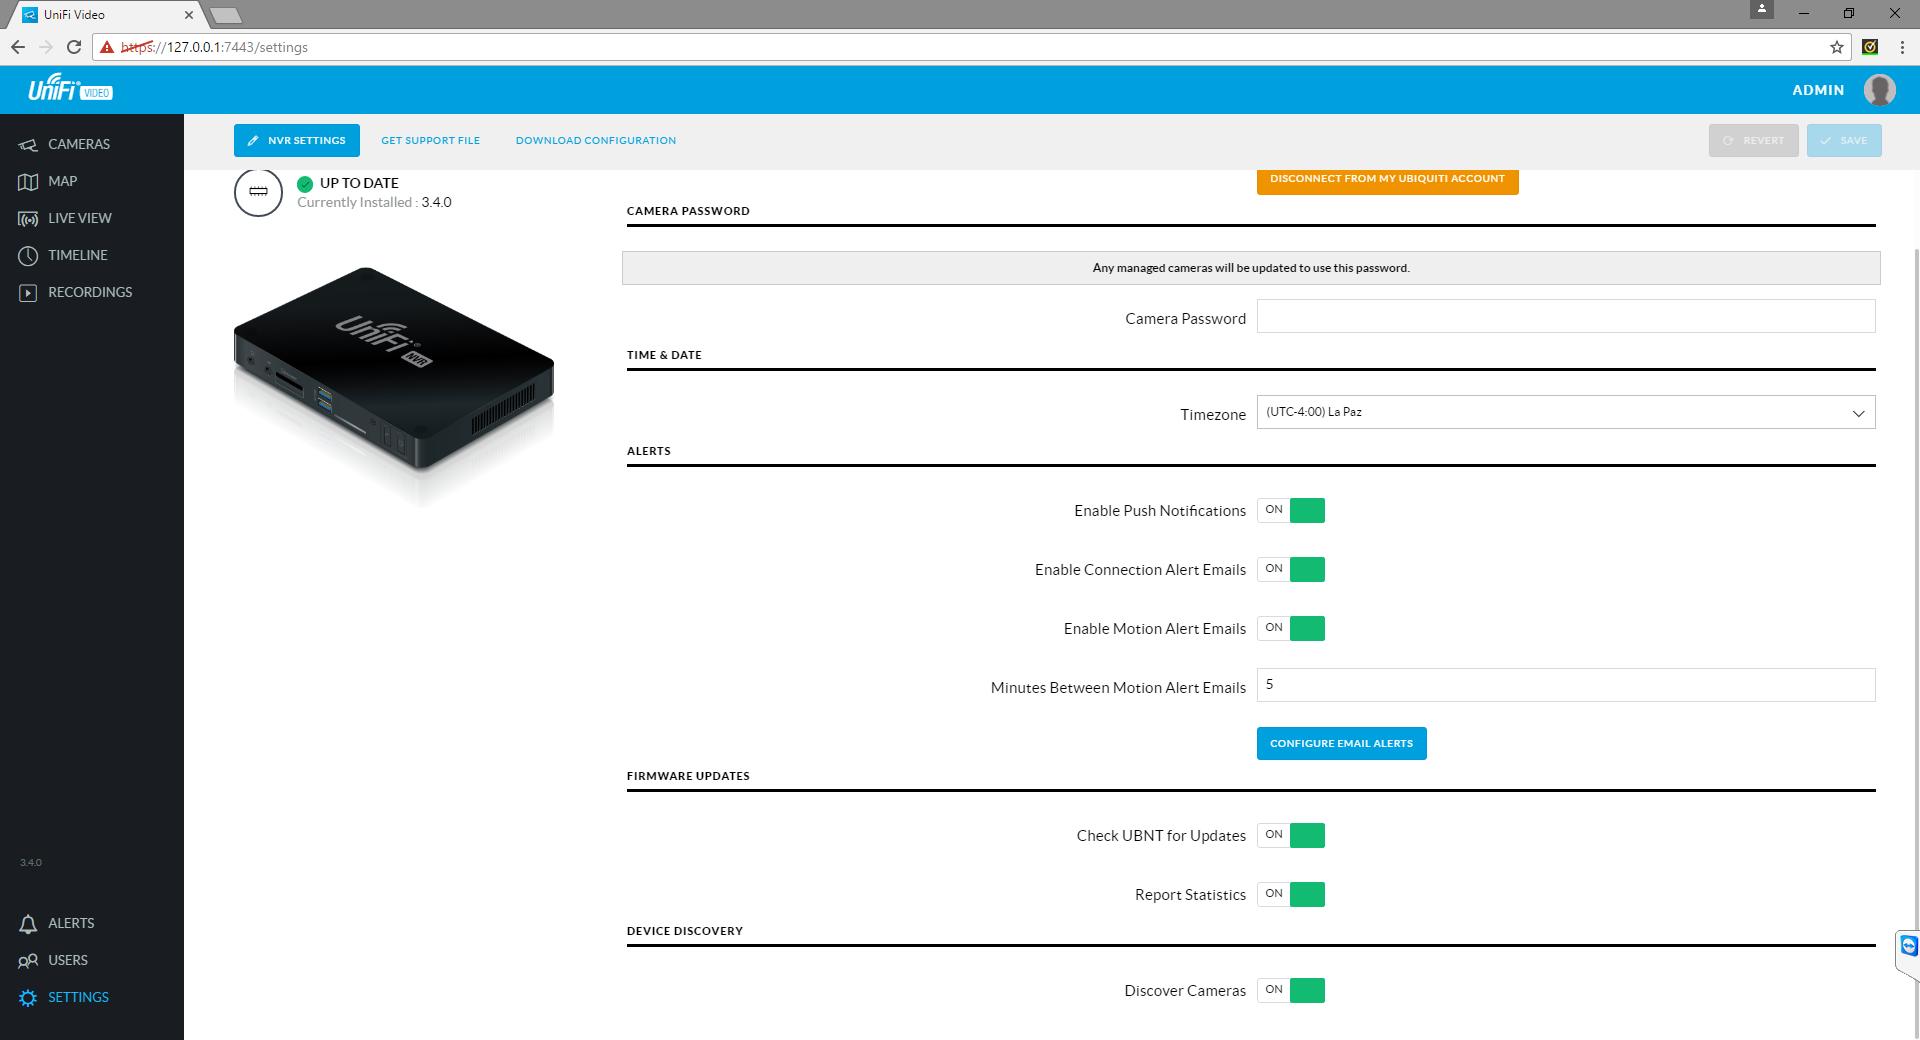 Unifi Video Windows record to NAS via Network Drive? | Ubiquiti